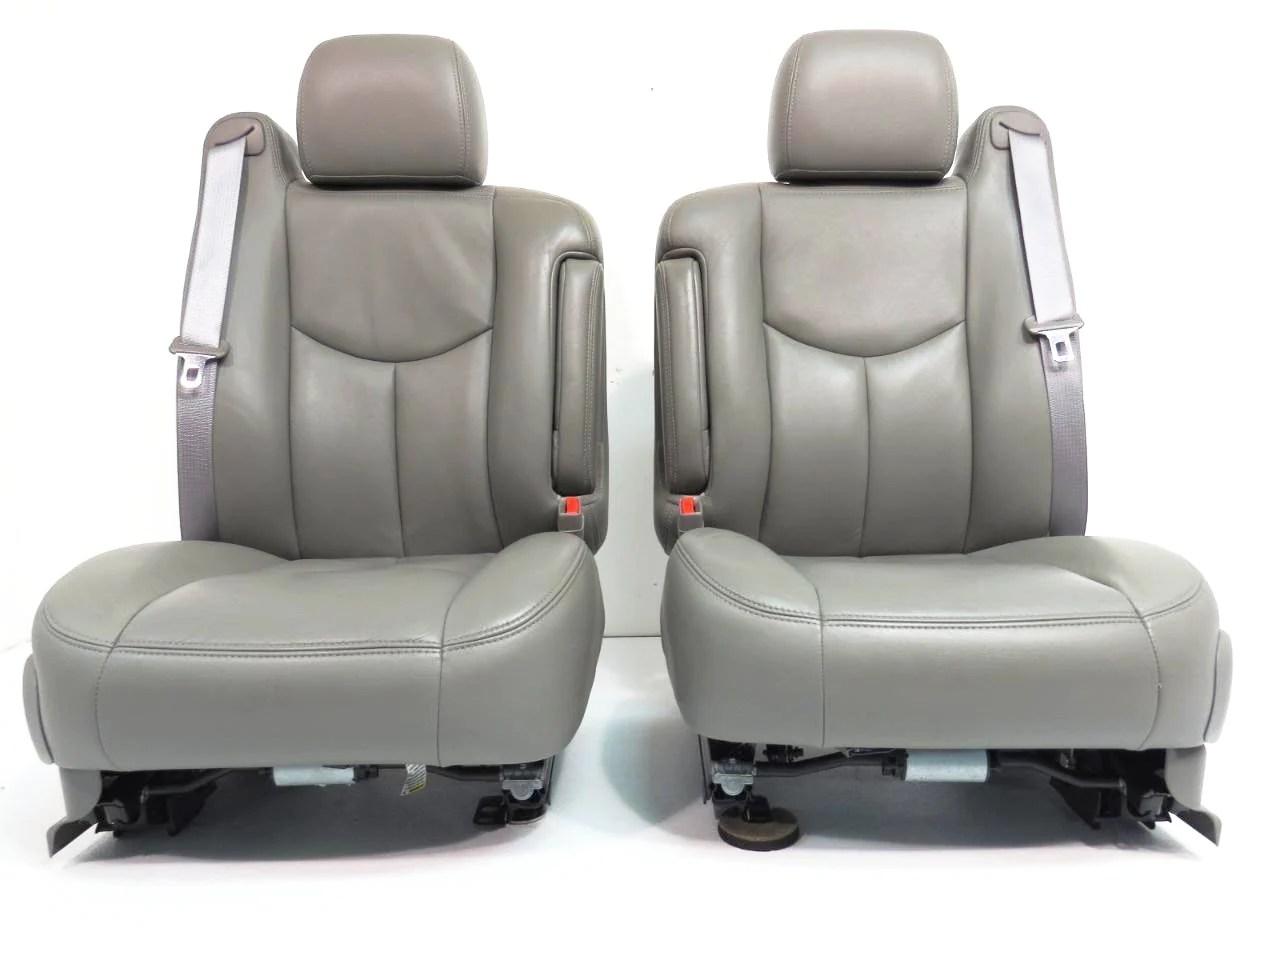 medium resolution of  chevy gmc silverado sierra tahoe yukon suburban oem leather seats pewter grey 2000 2001 2002 2003